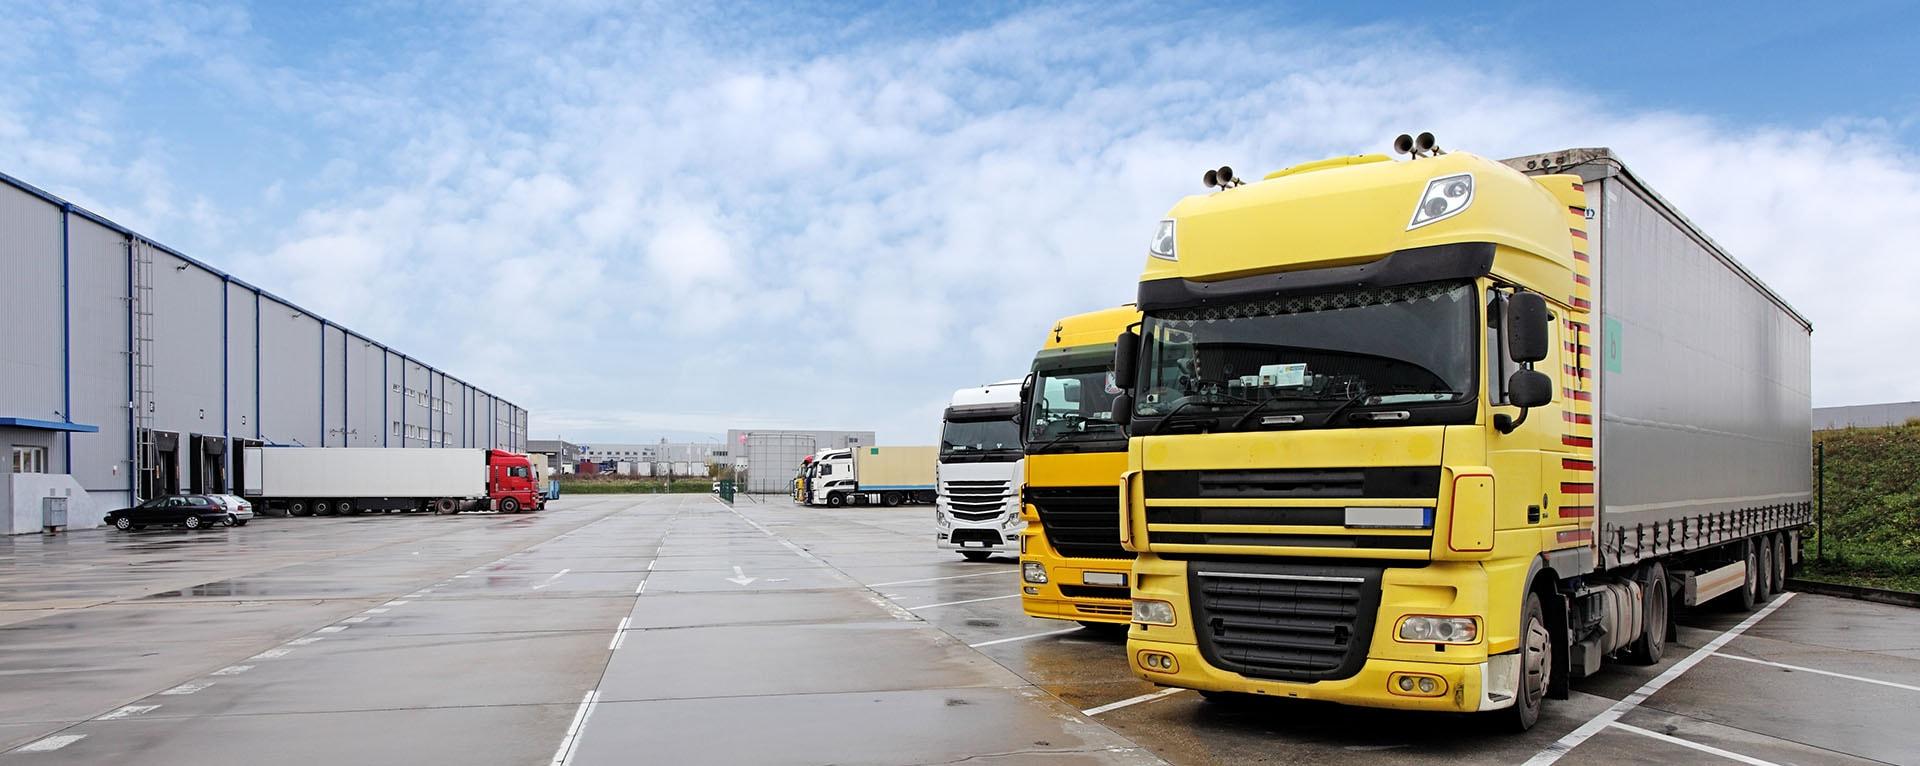 International Freight Forwarders - Air Freight Forwarders